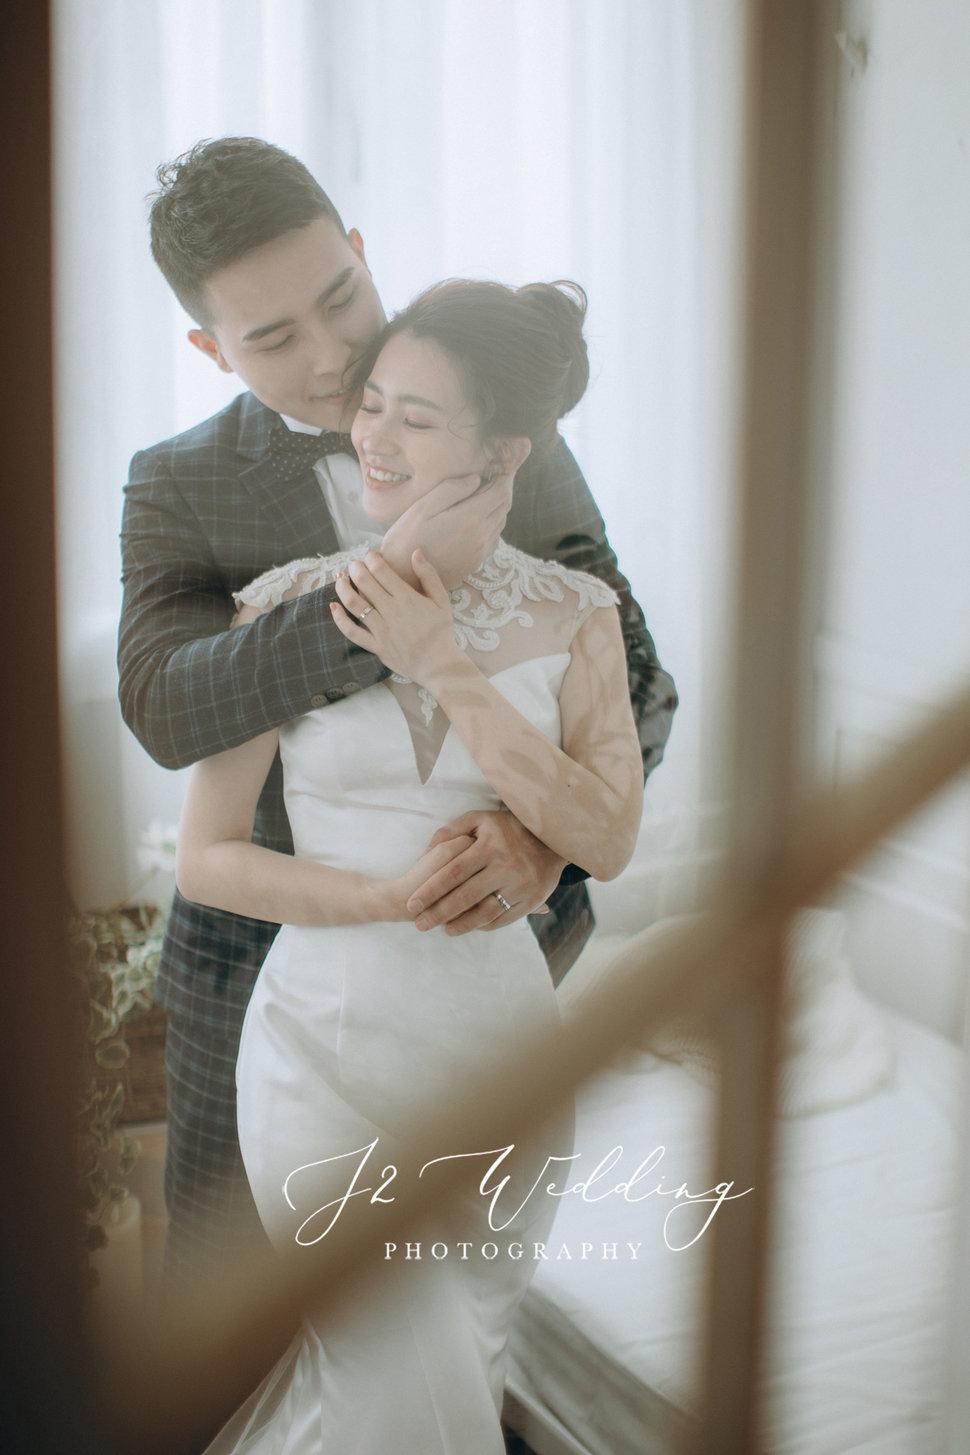 069A00186 - J2 wedding 中壢《結婚吧》